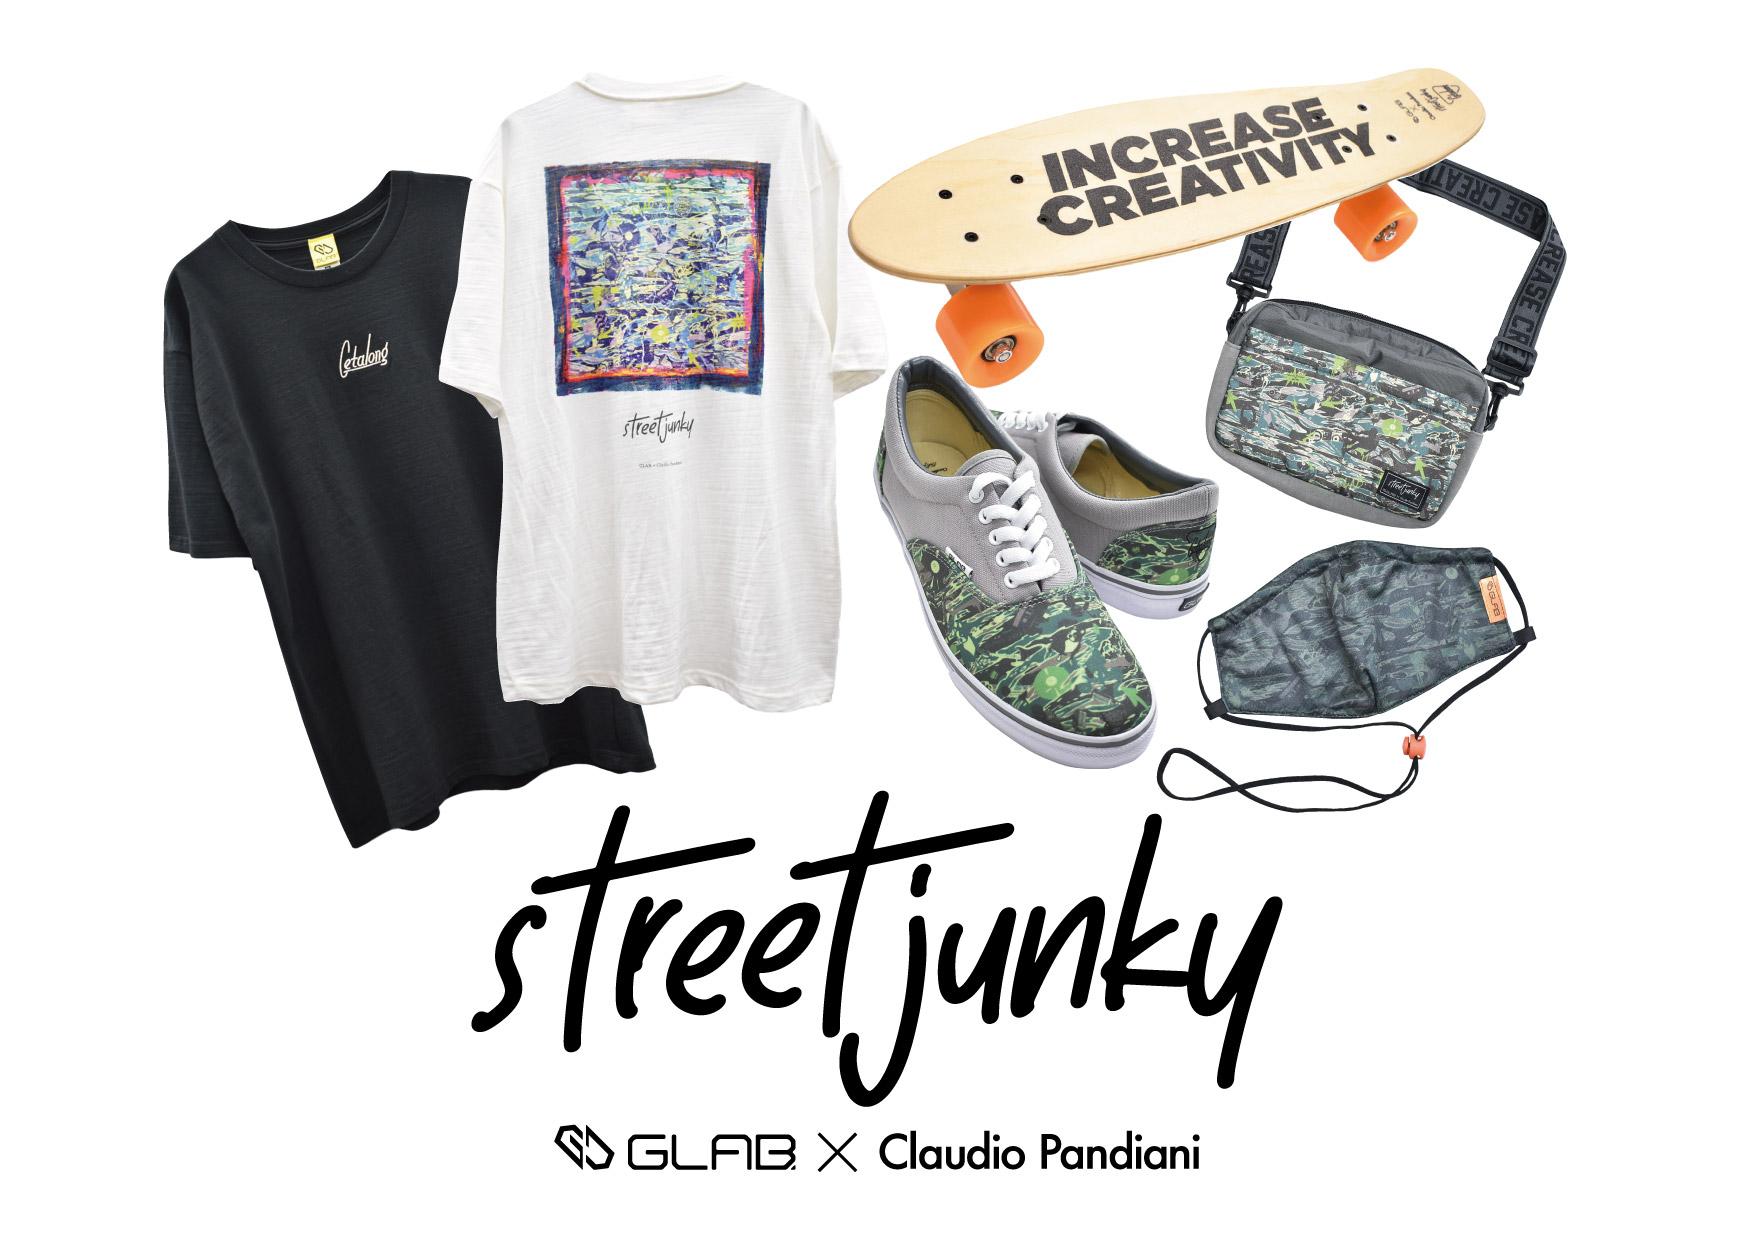 「street junky」Instagramプレゼント企画実施中!